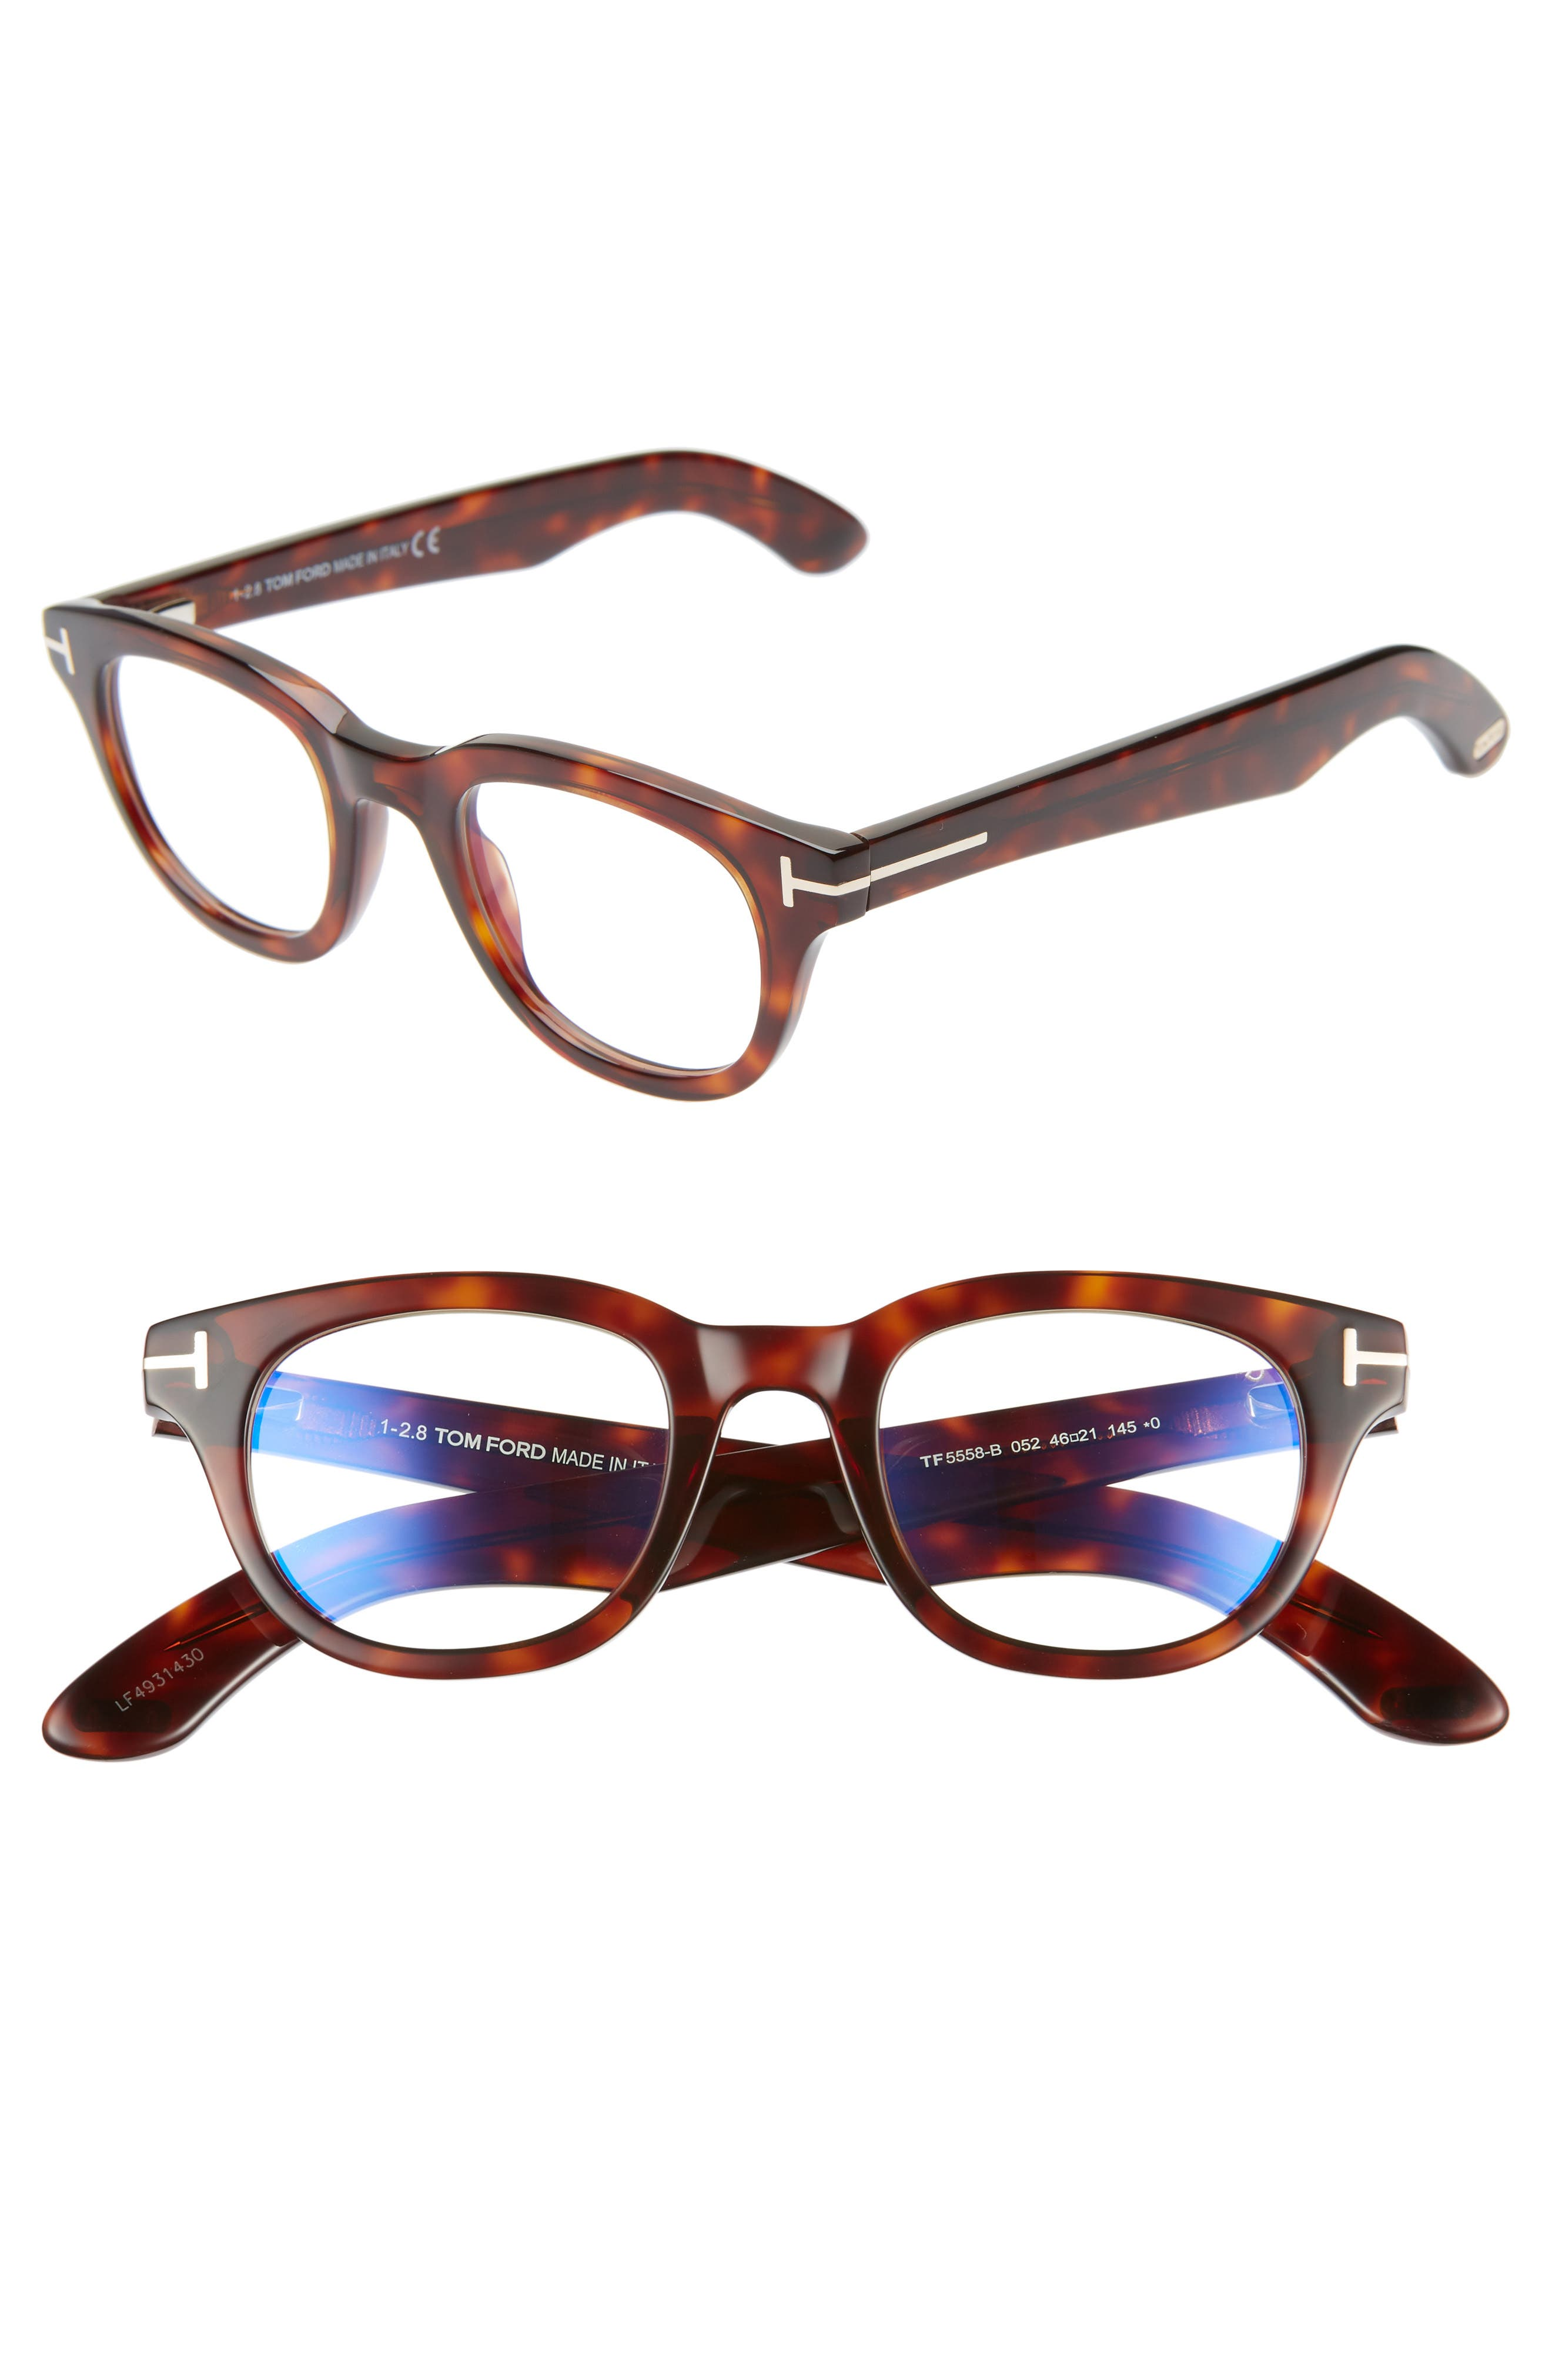 46mm Blue Light Blocking Glasses,                         Main,                         color, SHINY DARK HAVANA/ ROSE GOLD